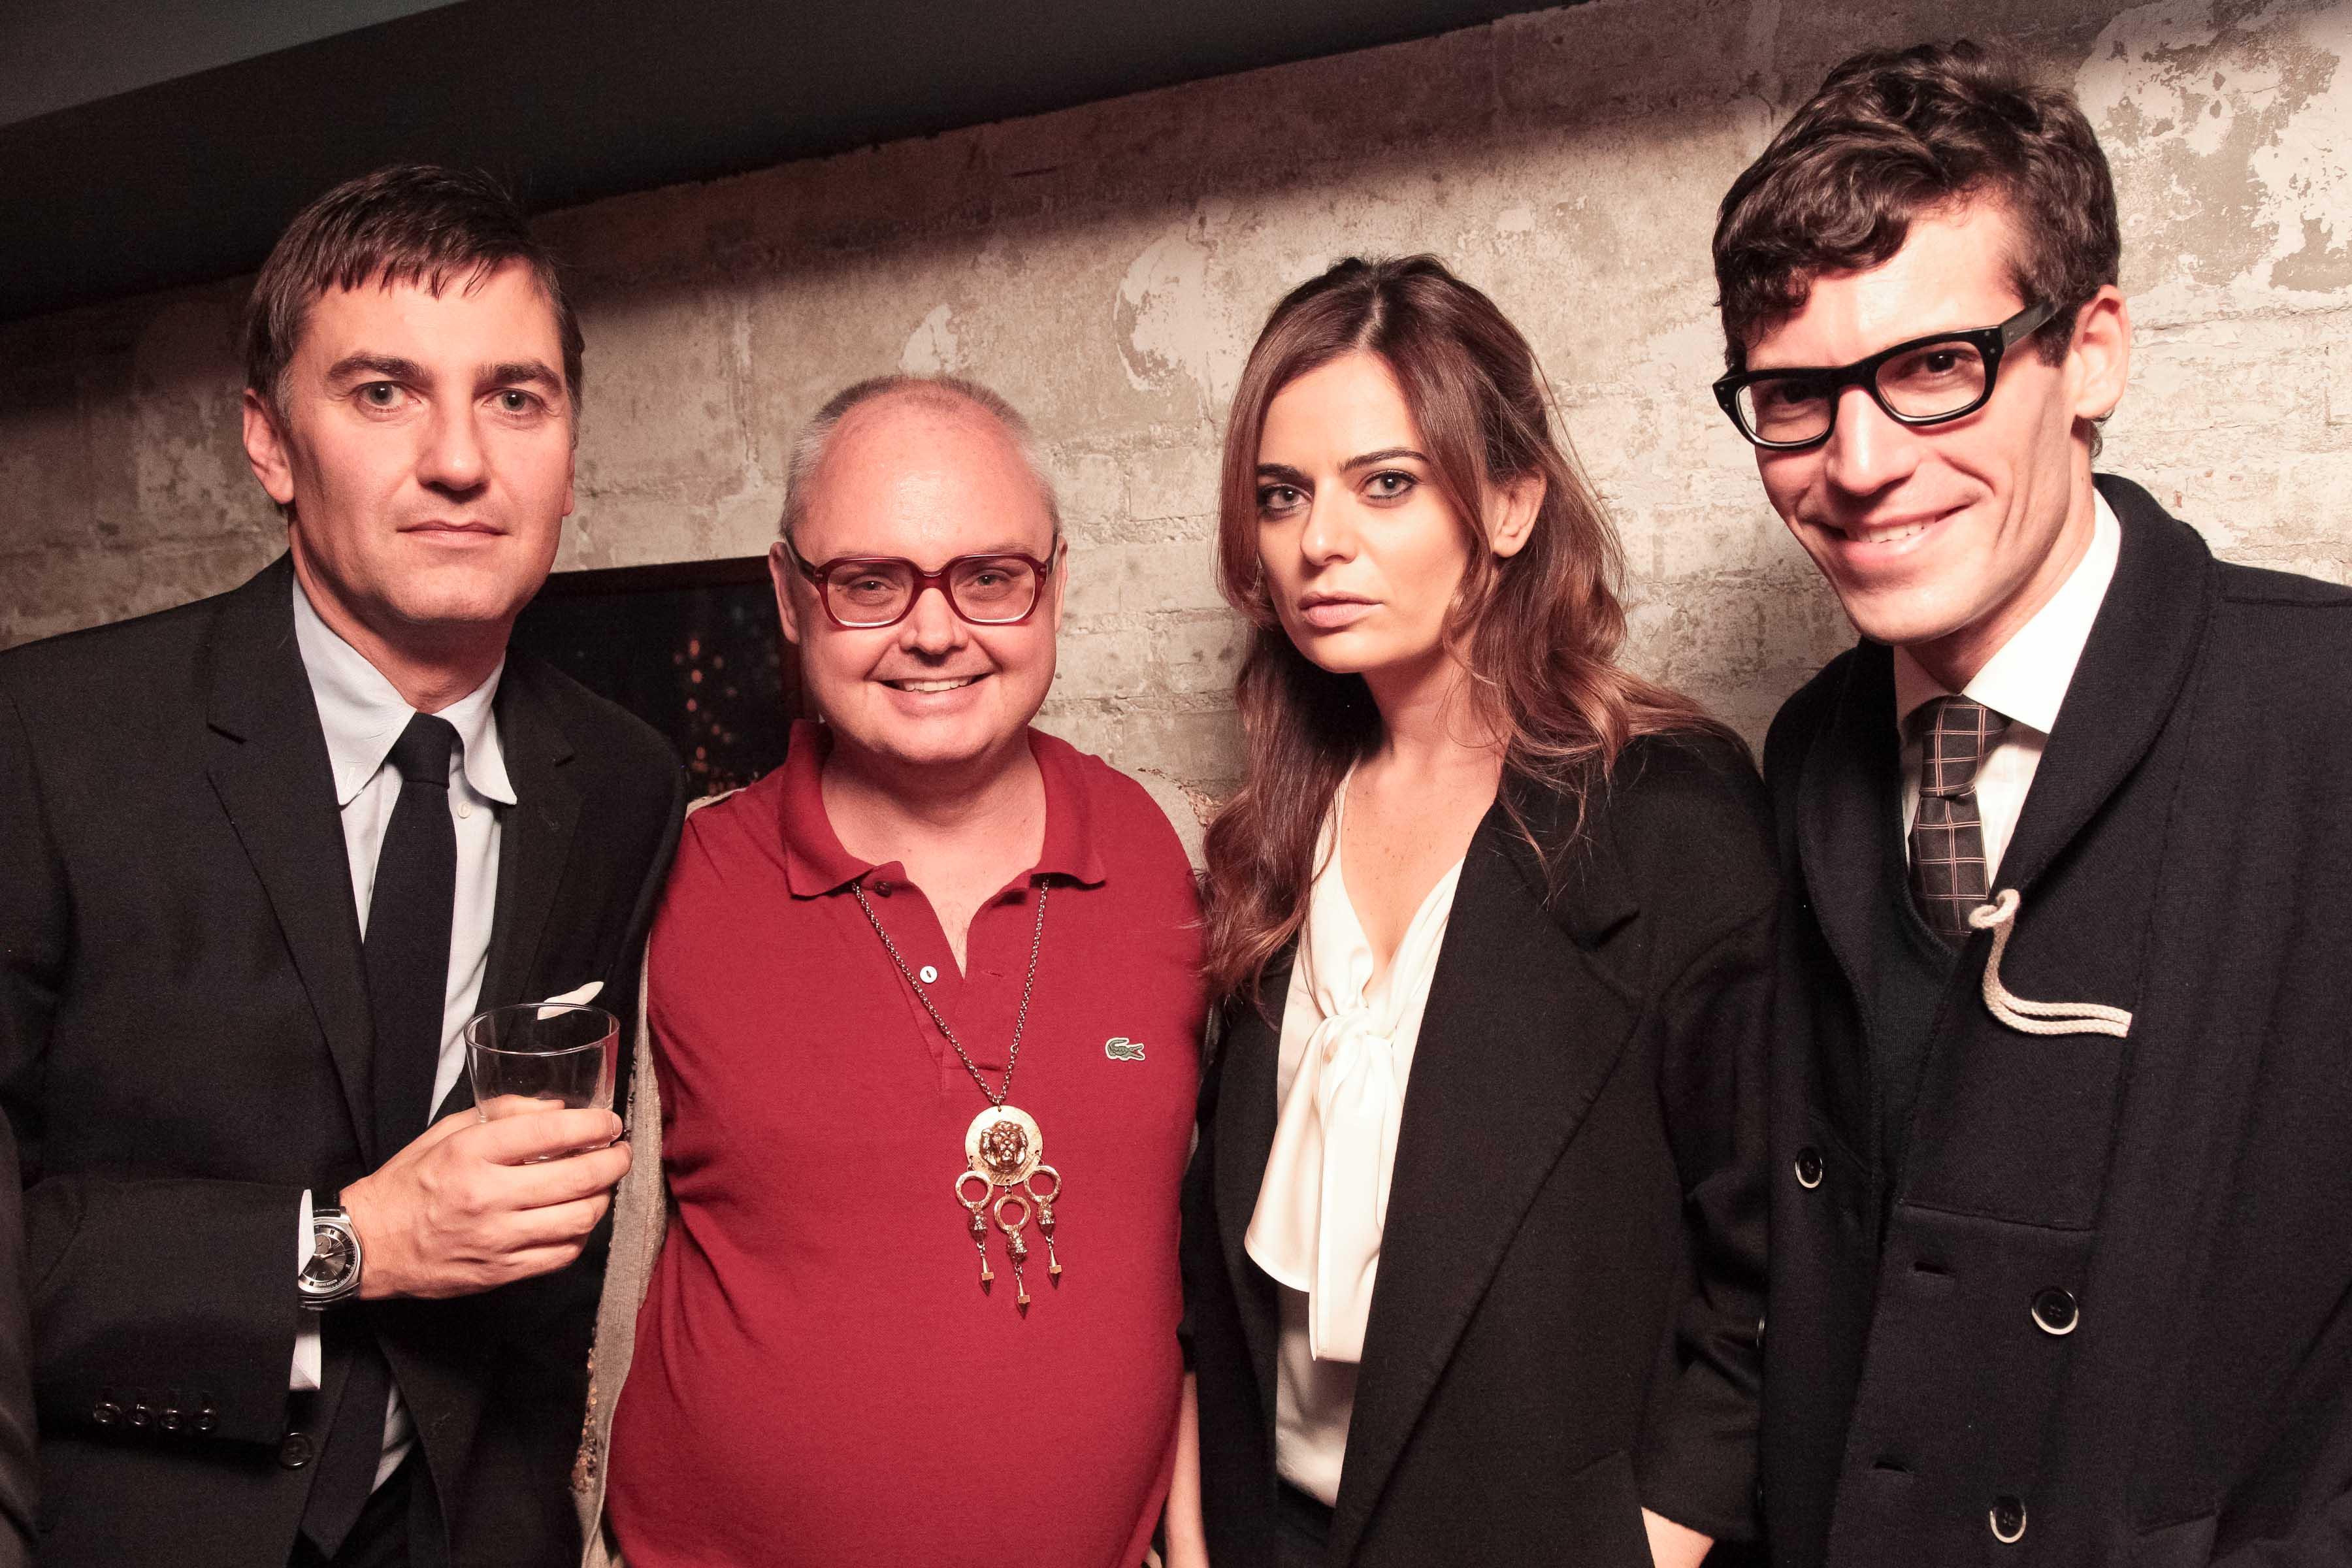 Euan Rellie, Mickey Boardman,Pamela Berkovic, Martin Marks